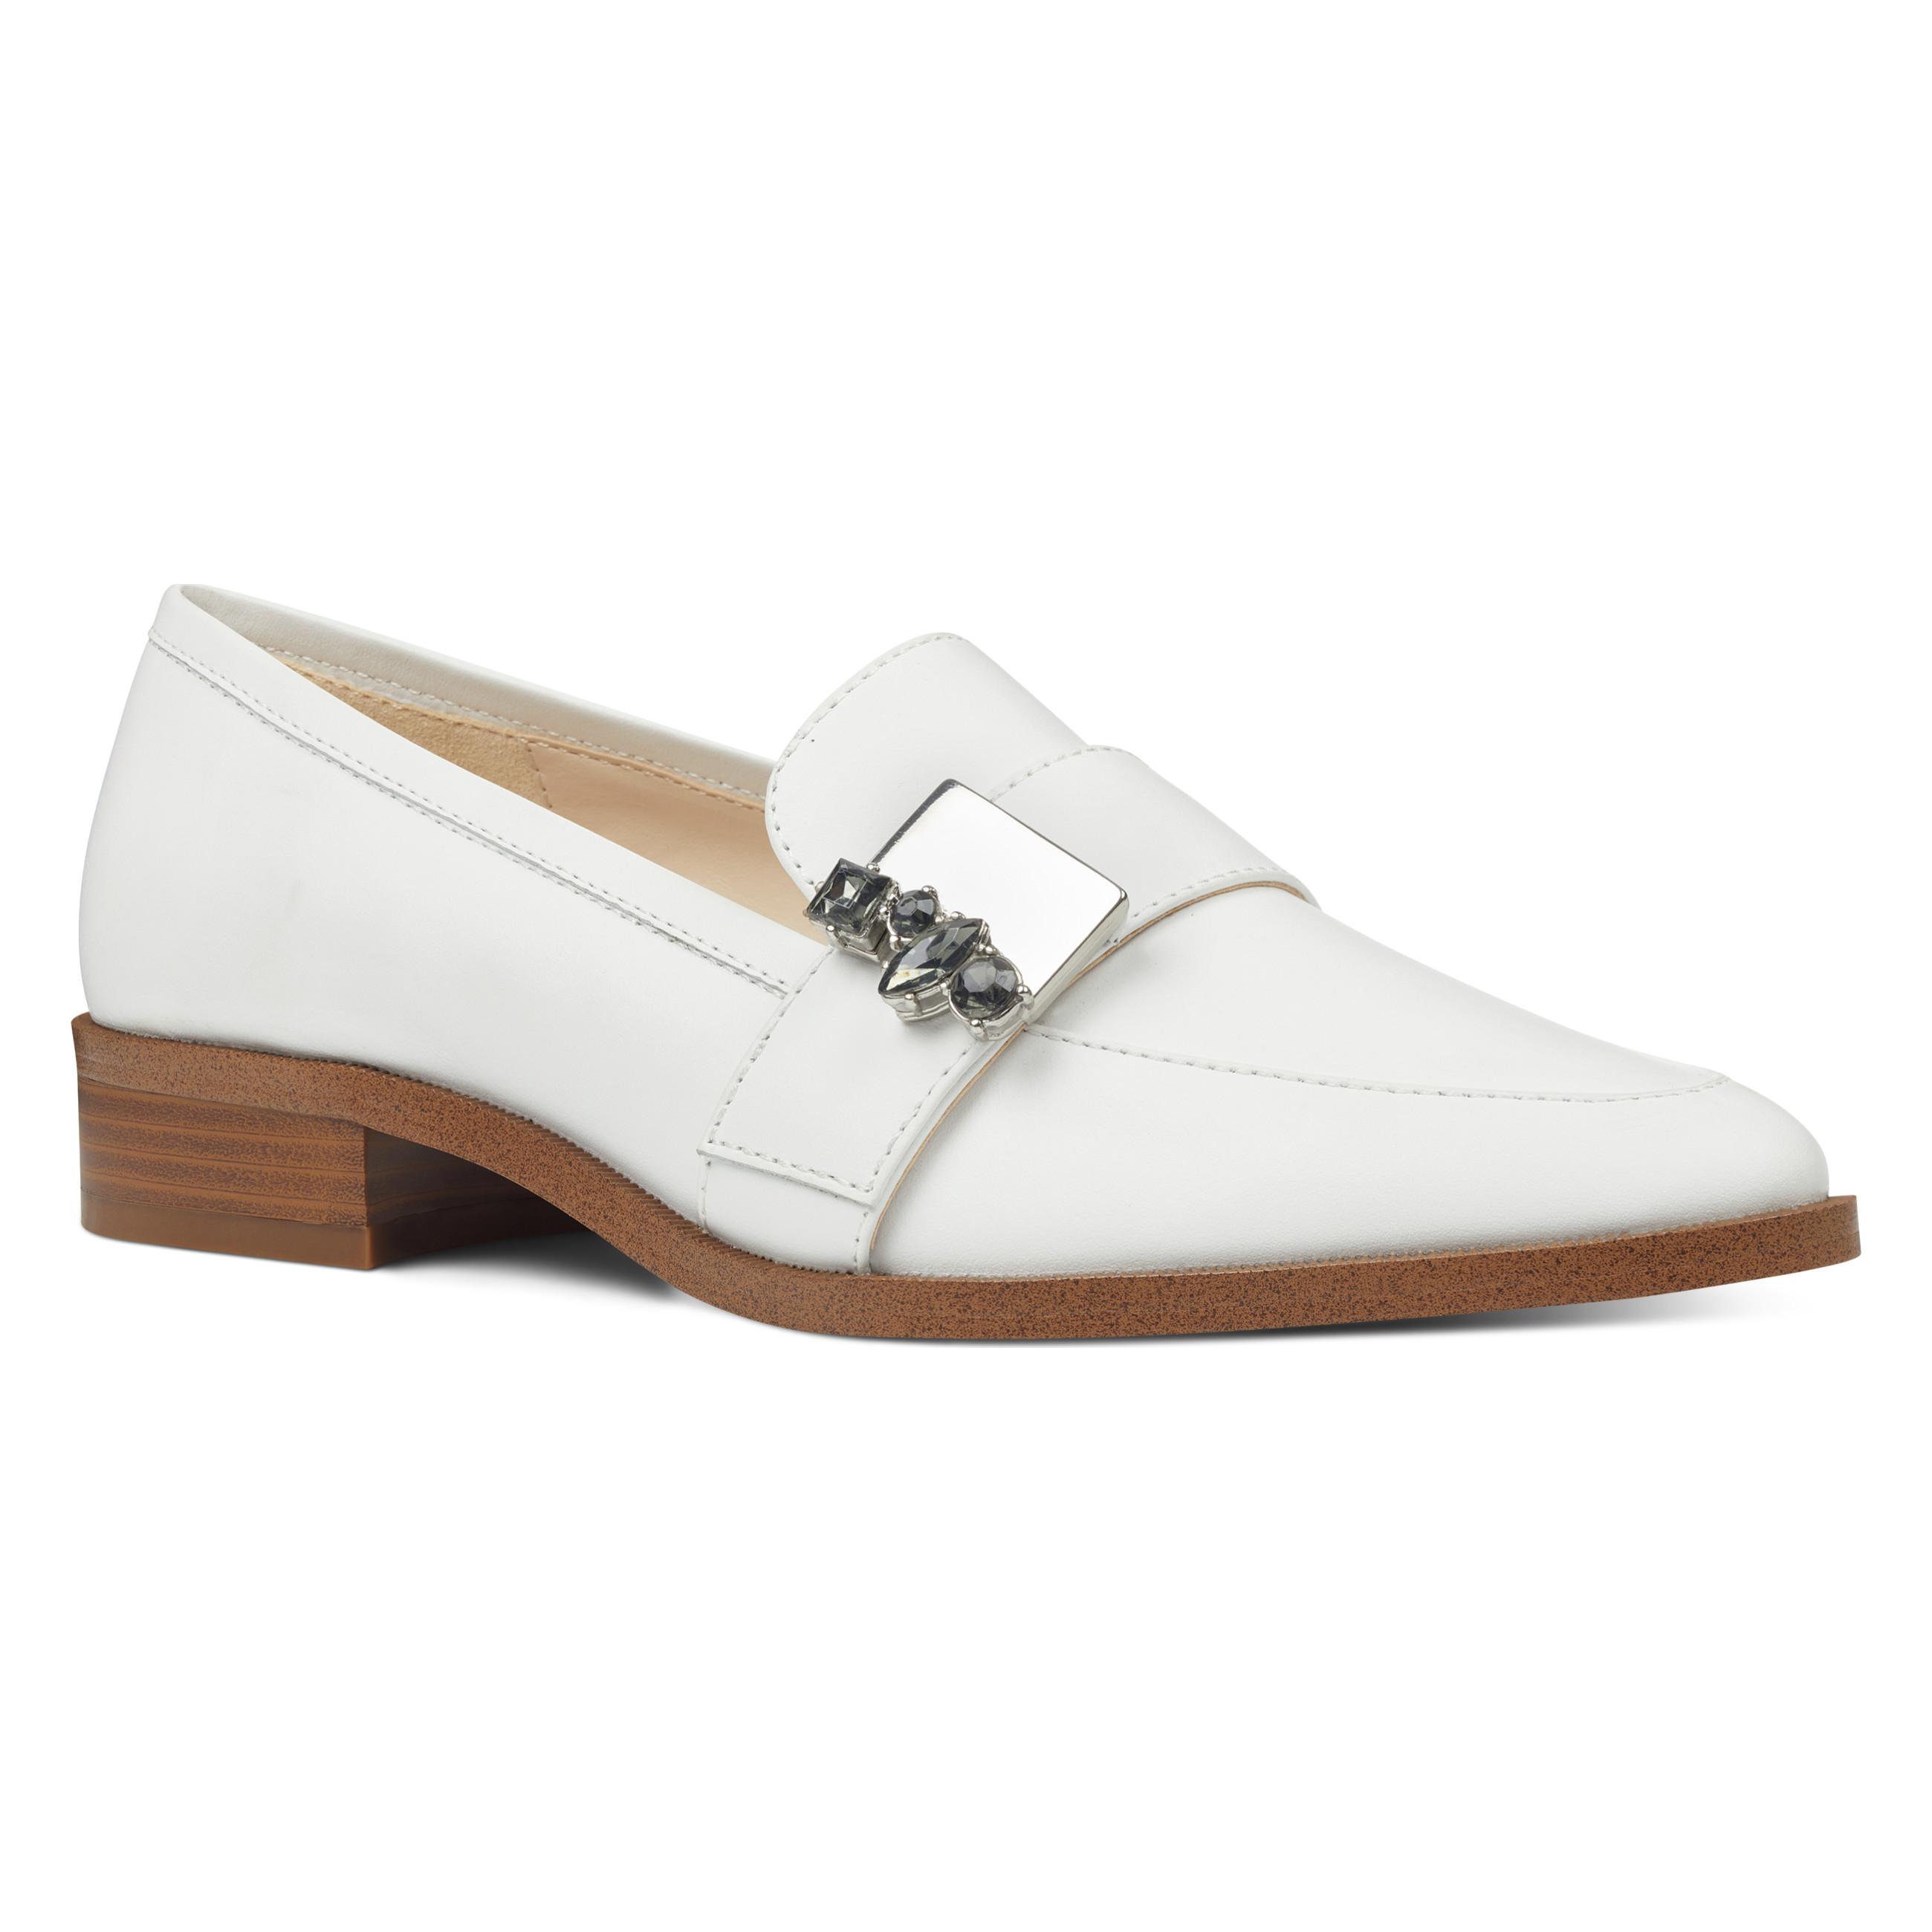 80a0c08b1a9 Lyst nine west westlake embellished loafers in white jpg 2600x2600 Nine west  vita oxford